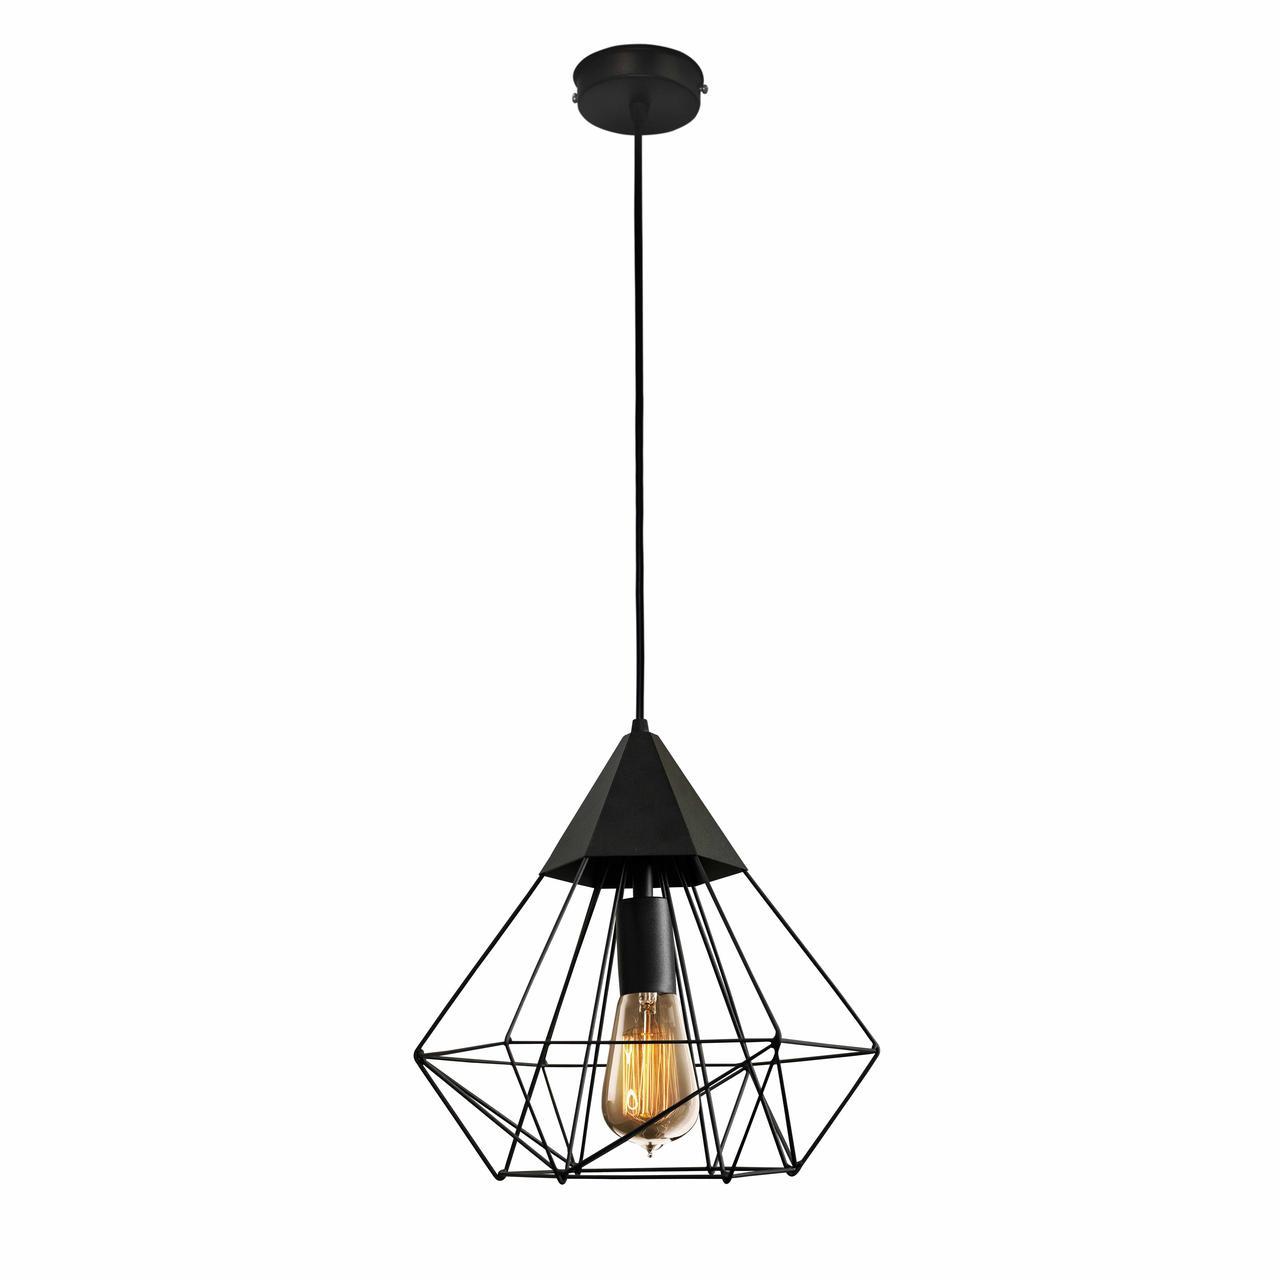 Светильник подвесной в стиле лофт MSK Electric NL 0538 new